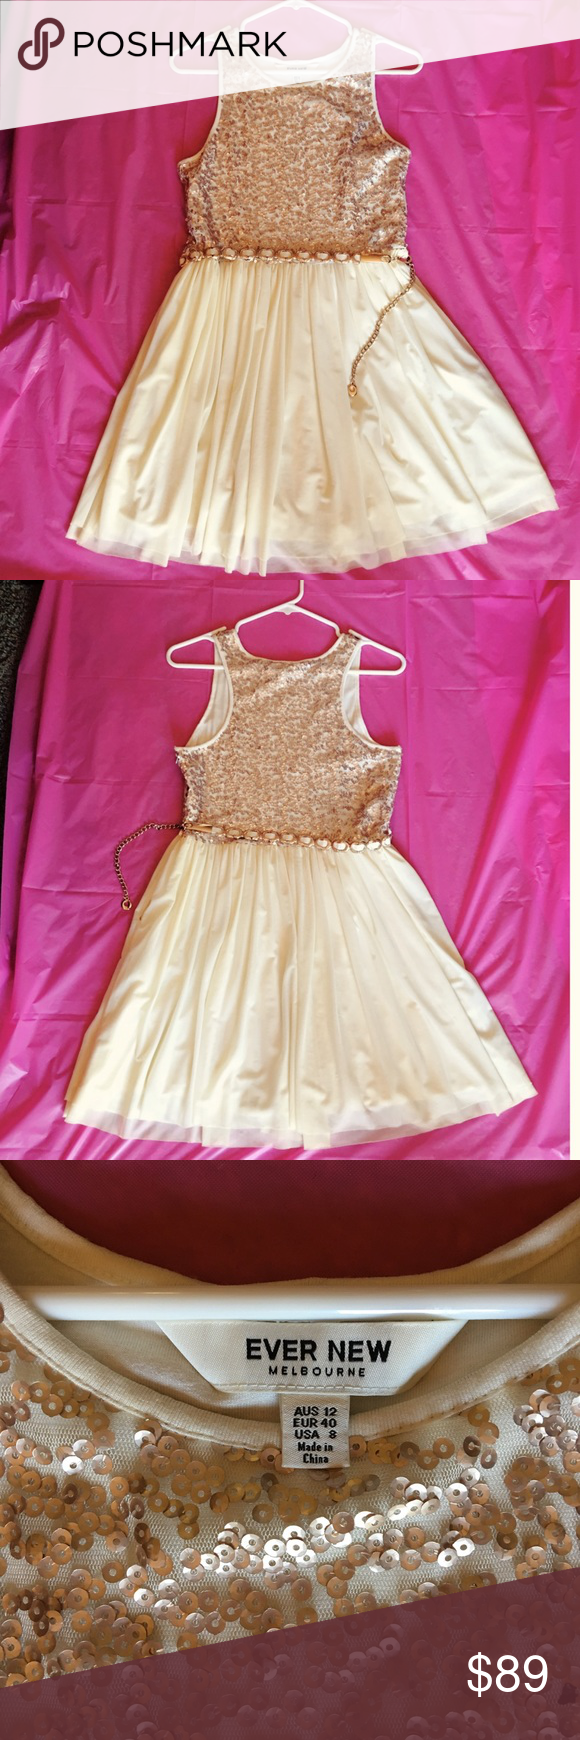 Ever new melbourne party dress evening dress white belt